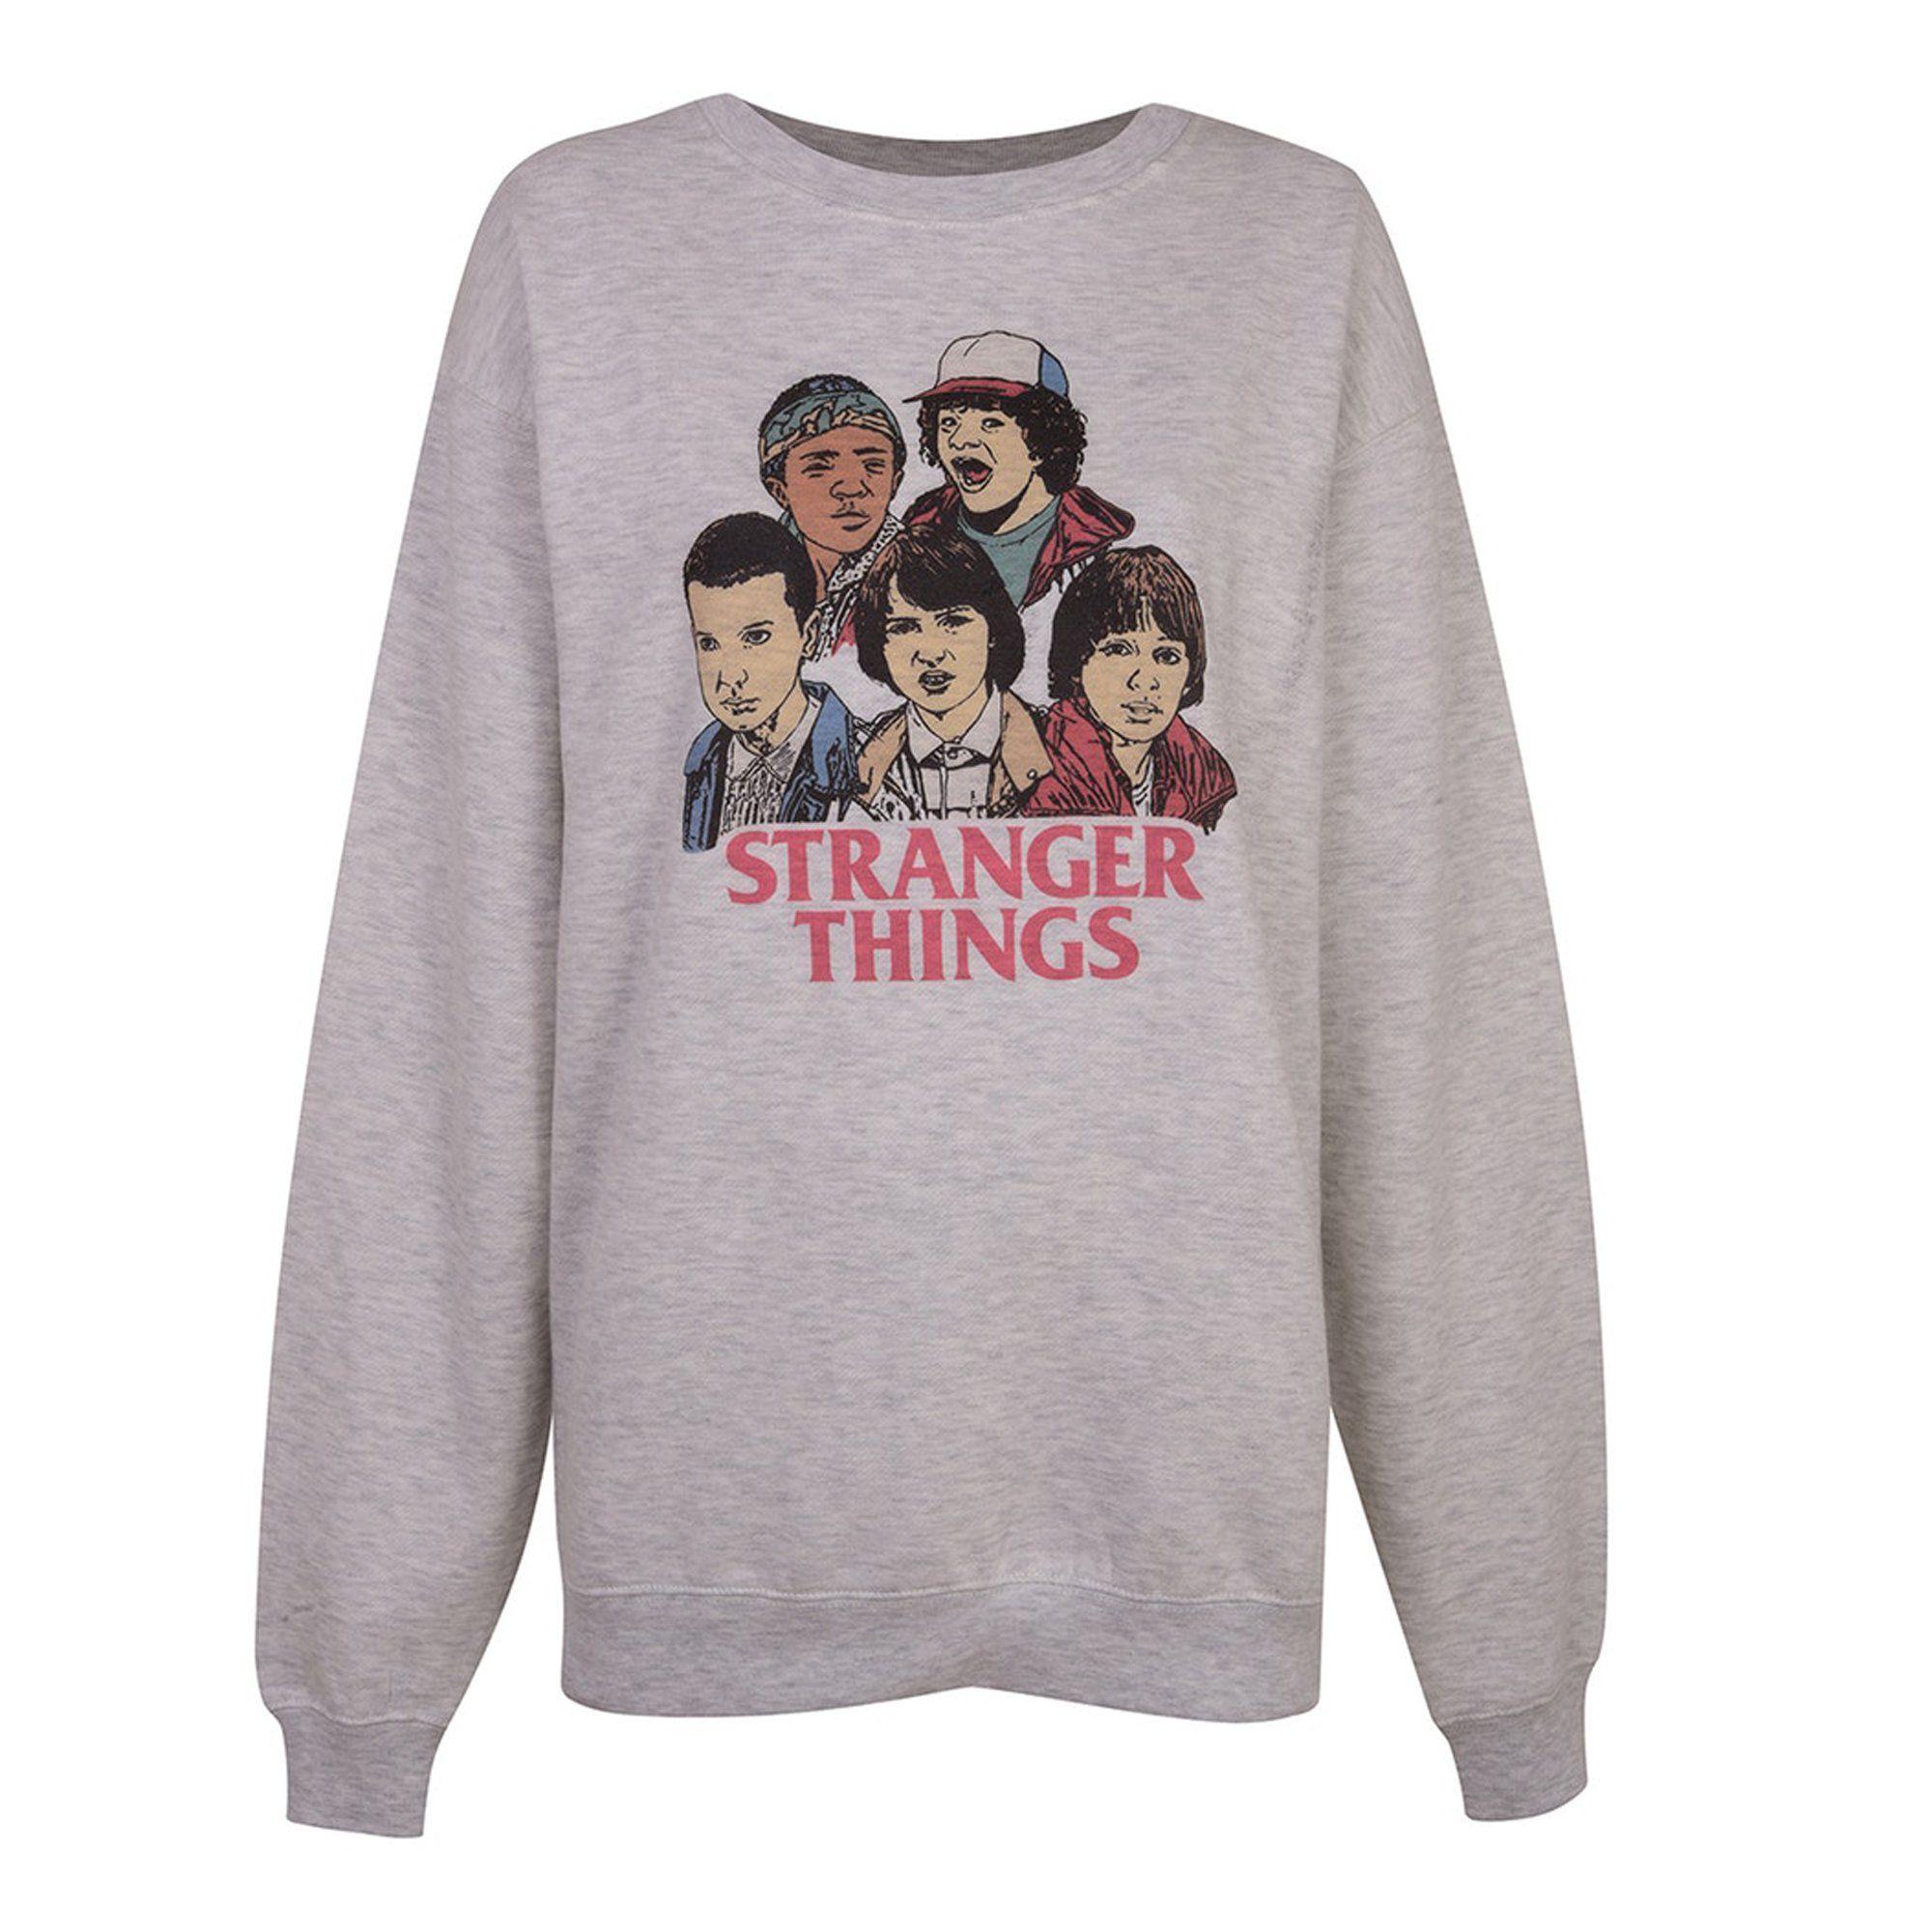 Sweatshirt Top Shop X Stranger Things Ropa De Galaxias Ropa H M Ropa Preadolescente [ 2000 x 2000 Pixel ]